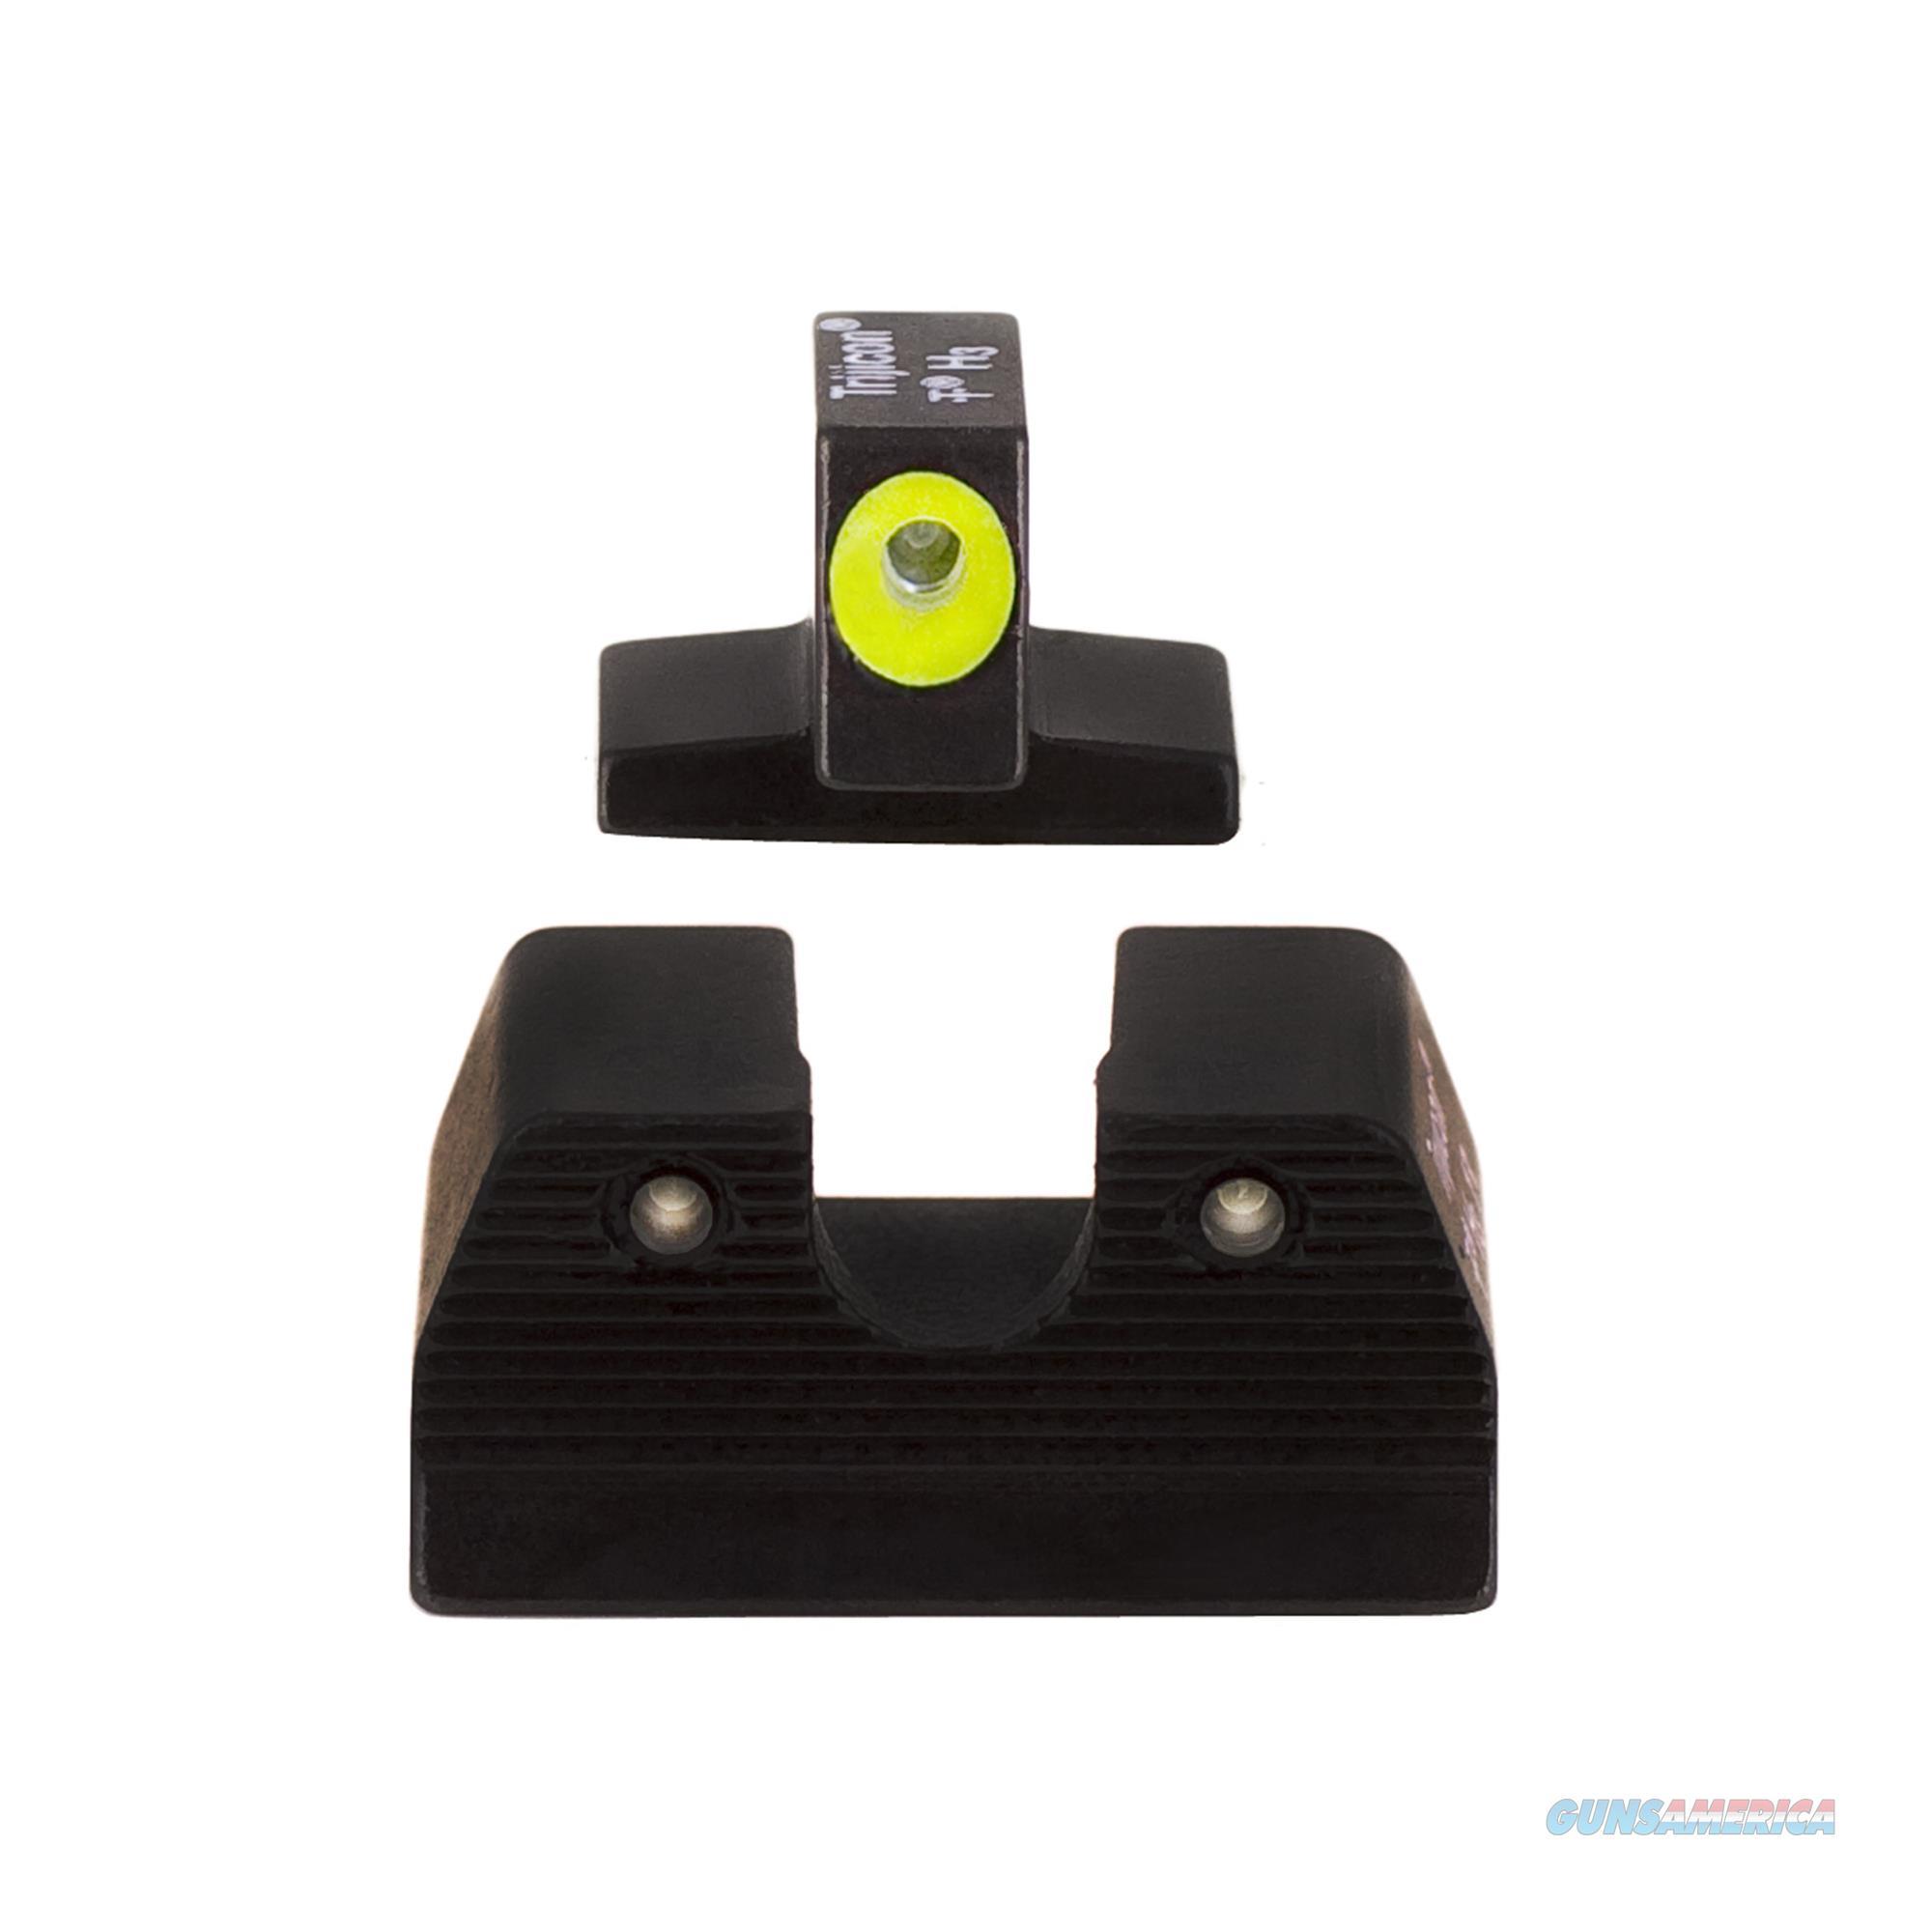 Trijicon Fnh Hd Night Sight Set FN101-C-600676  Non-Guns > Iron/Metal/Peep Sights